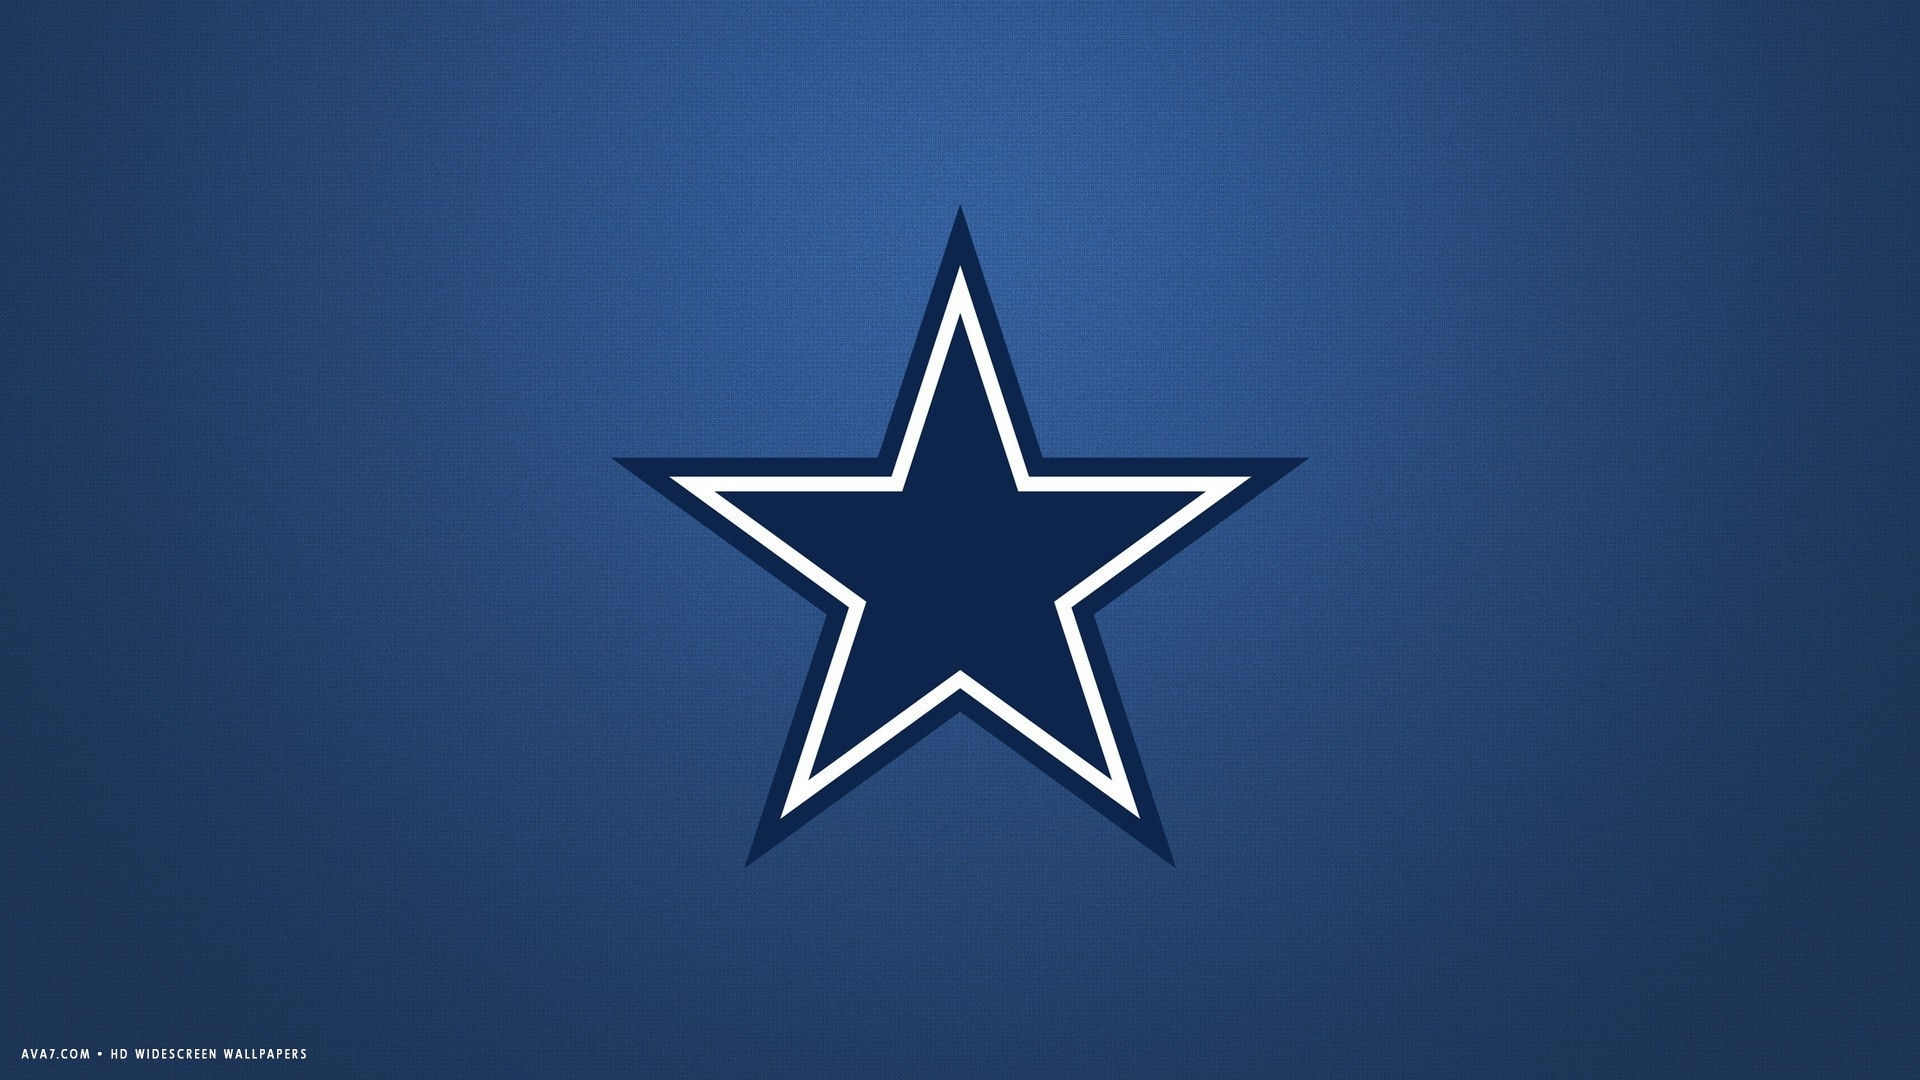 dallas cowboys nfl football team hd widescreen wallpaper / american